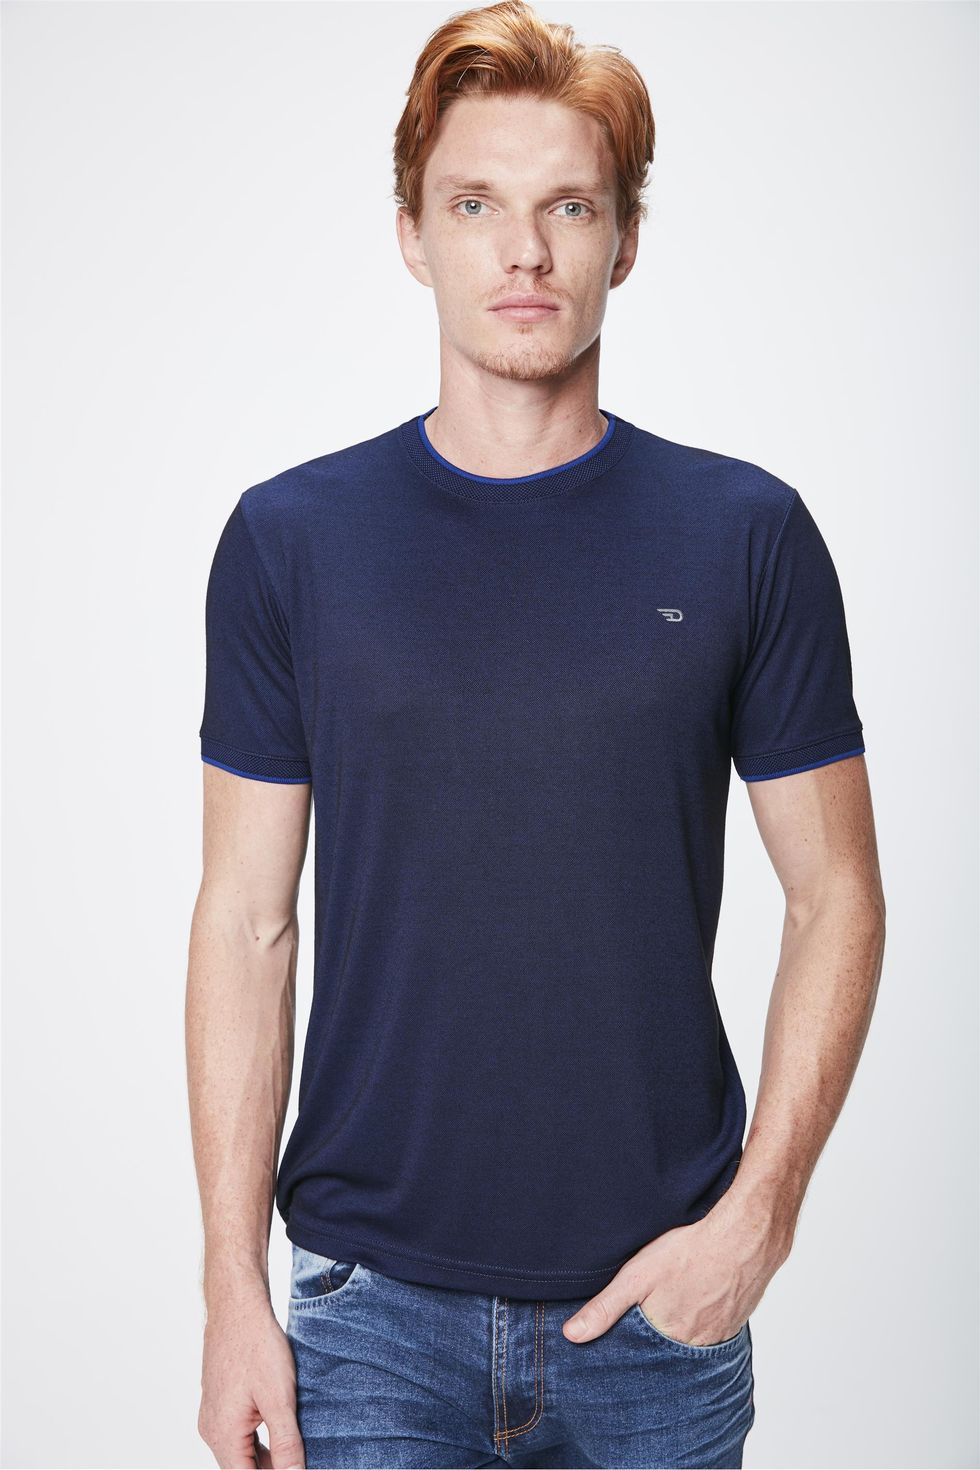 Camiseta-Masculina-College-Lisa-Frente--